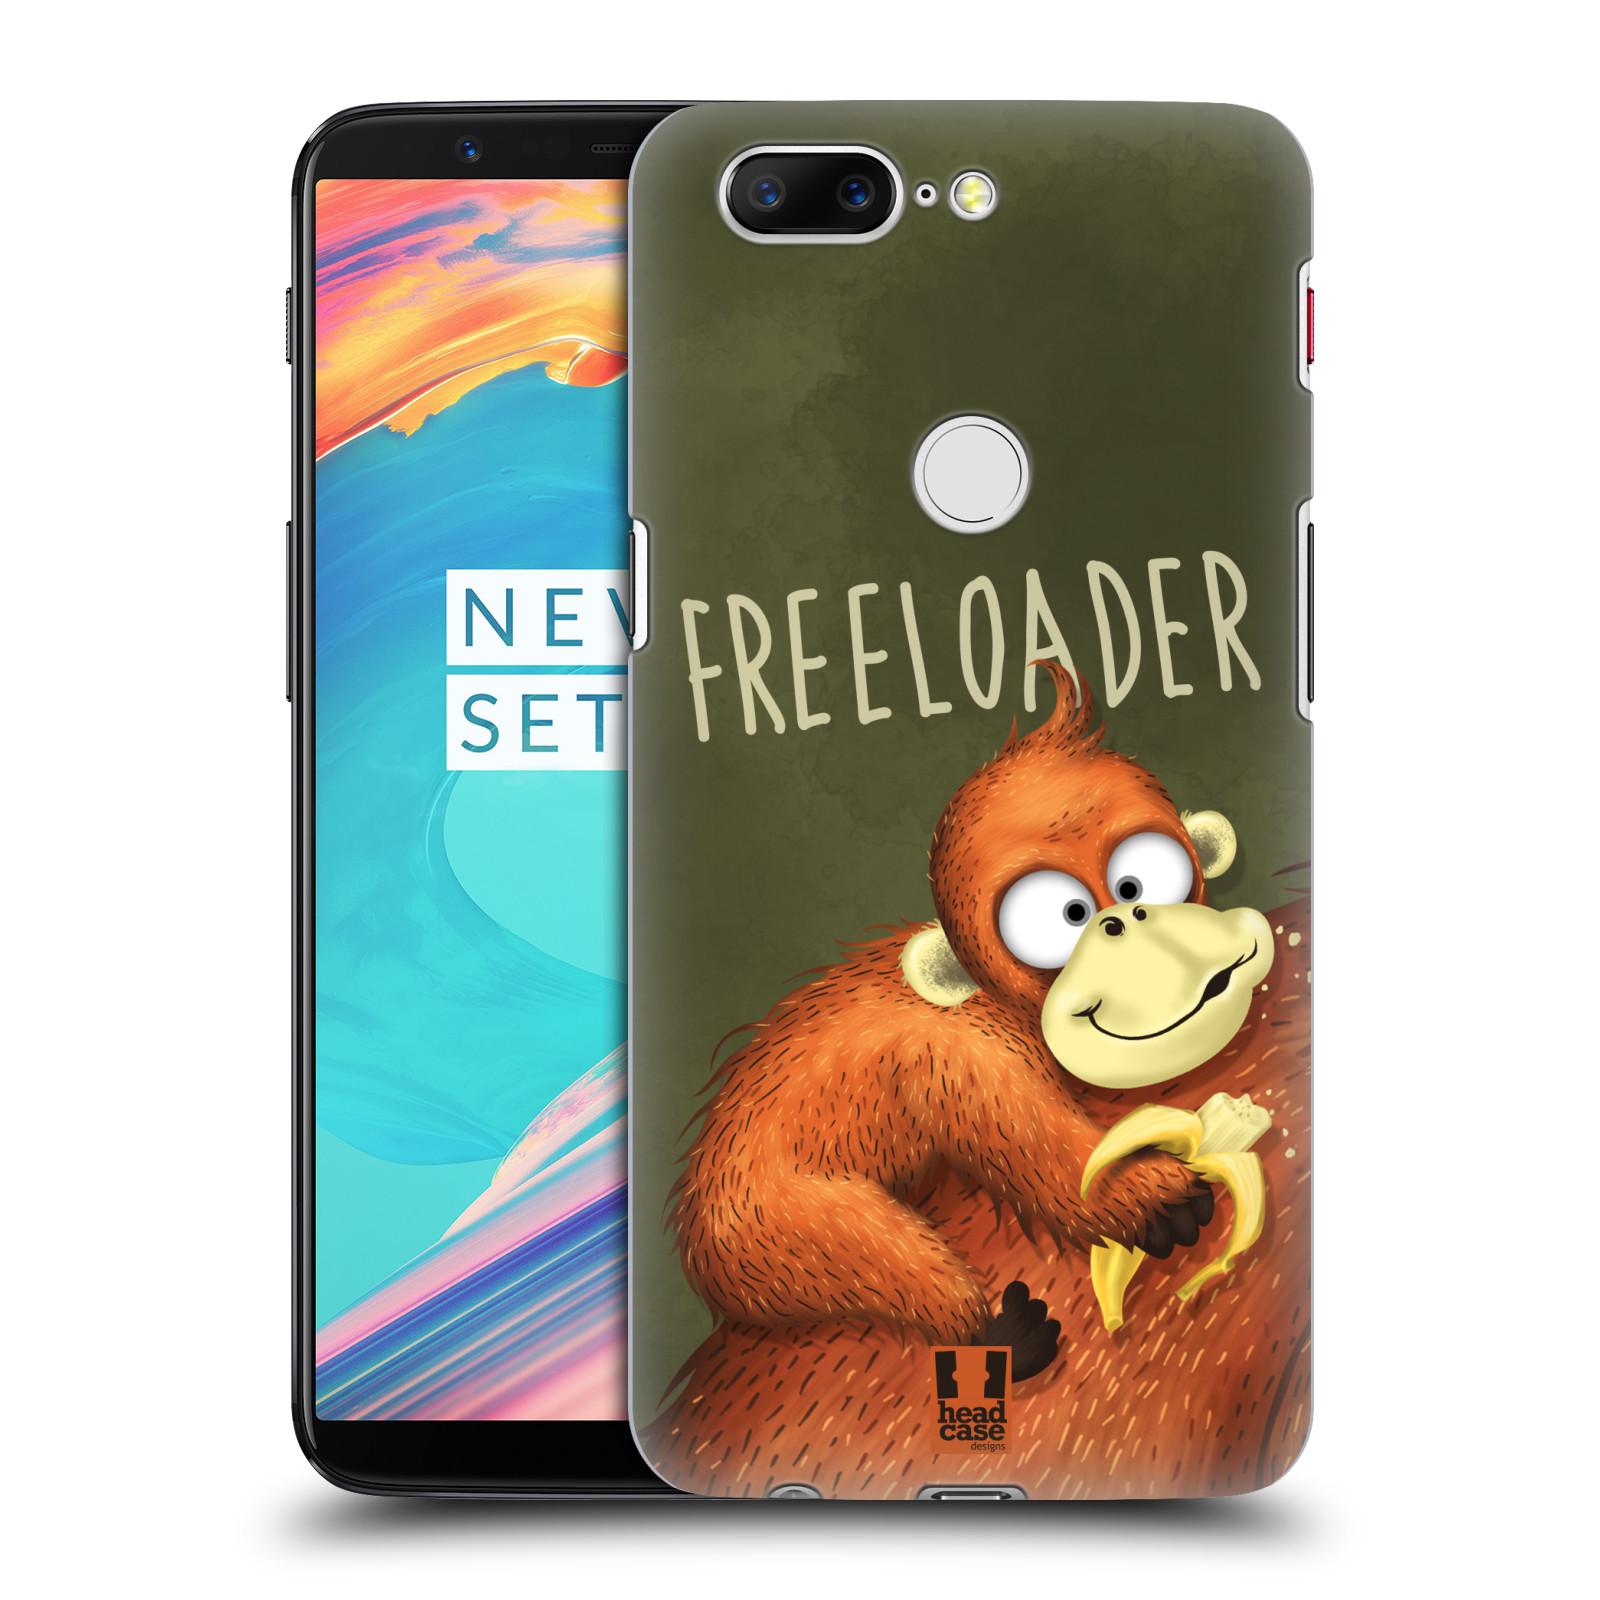 Plastové pouzdro na mobil OnePlus 5T - Head Case - Opičák Freeloader